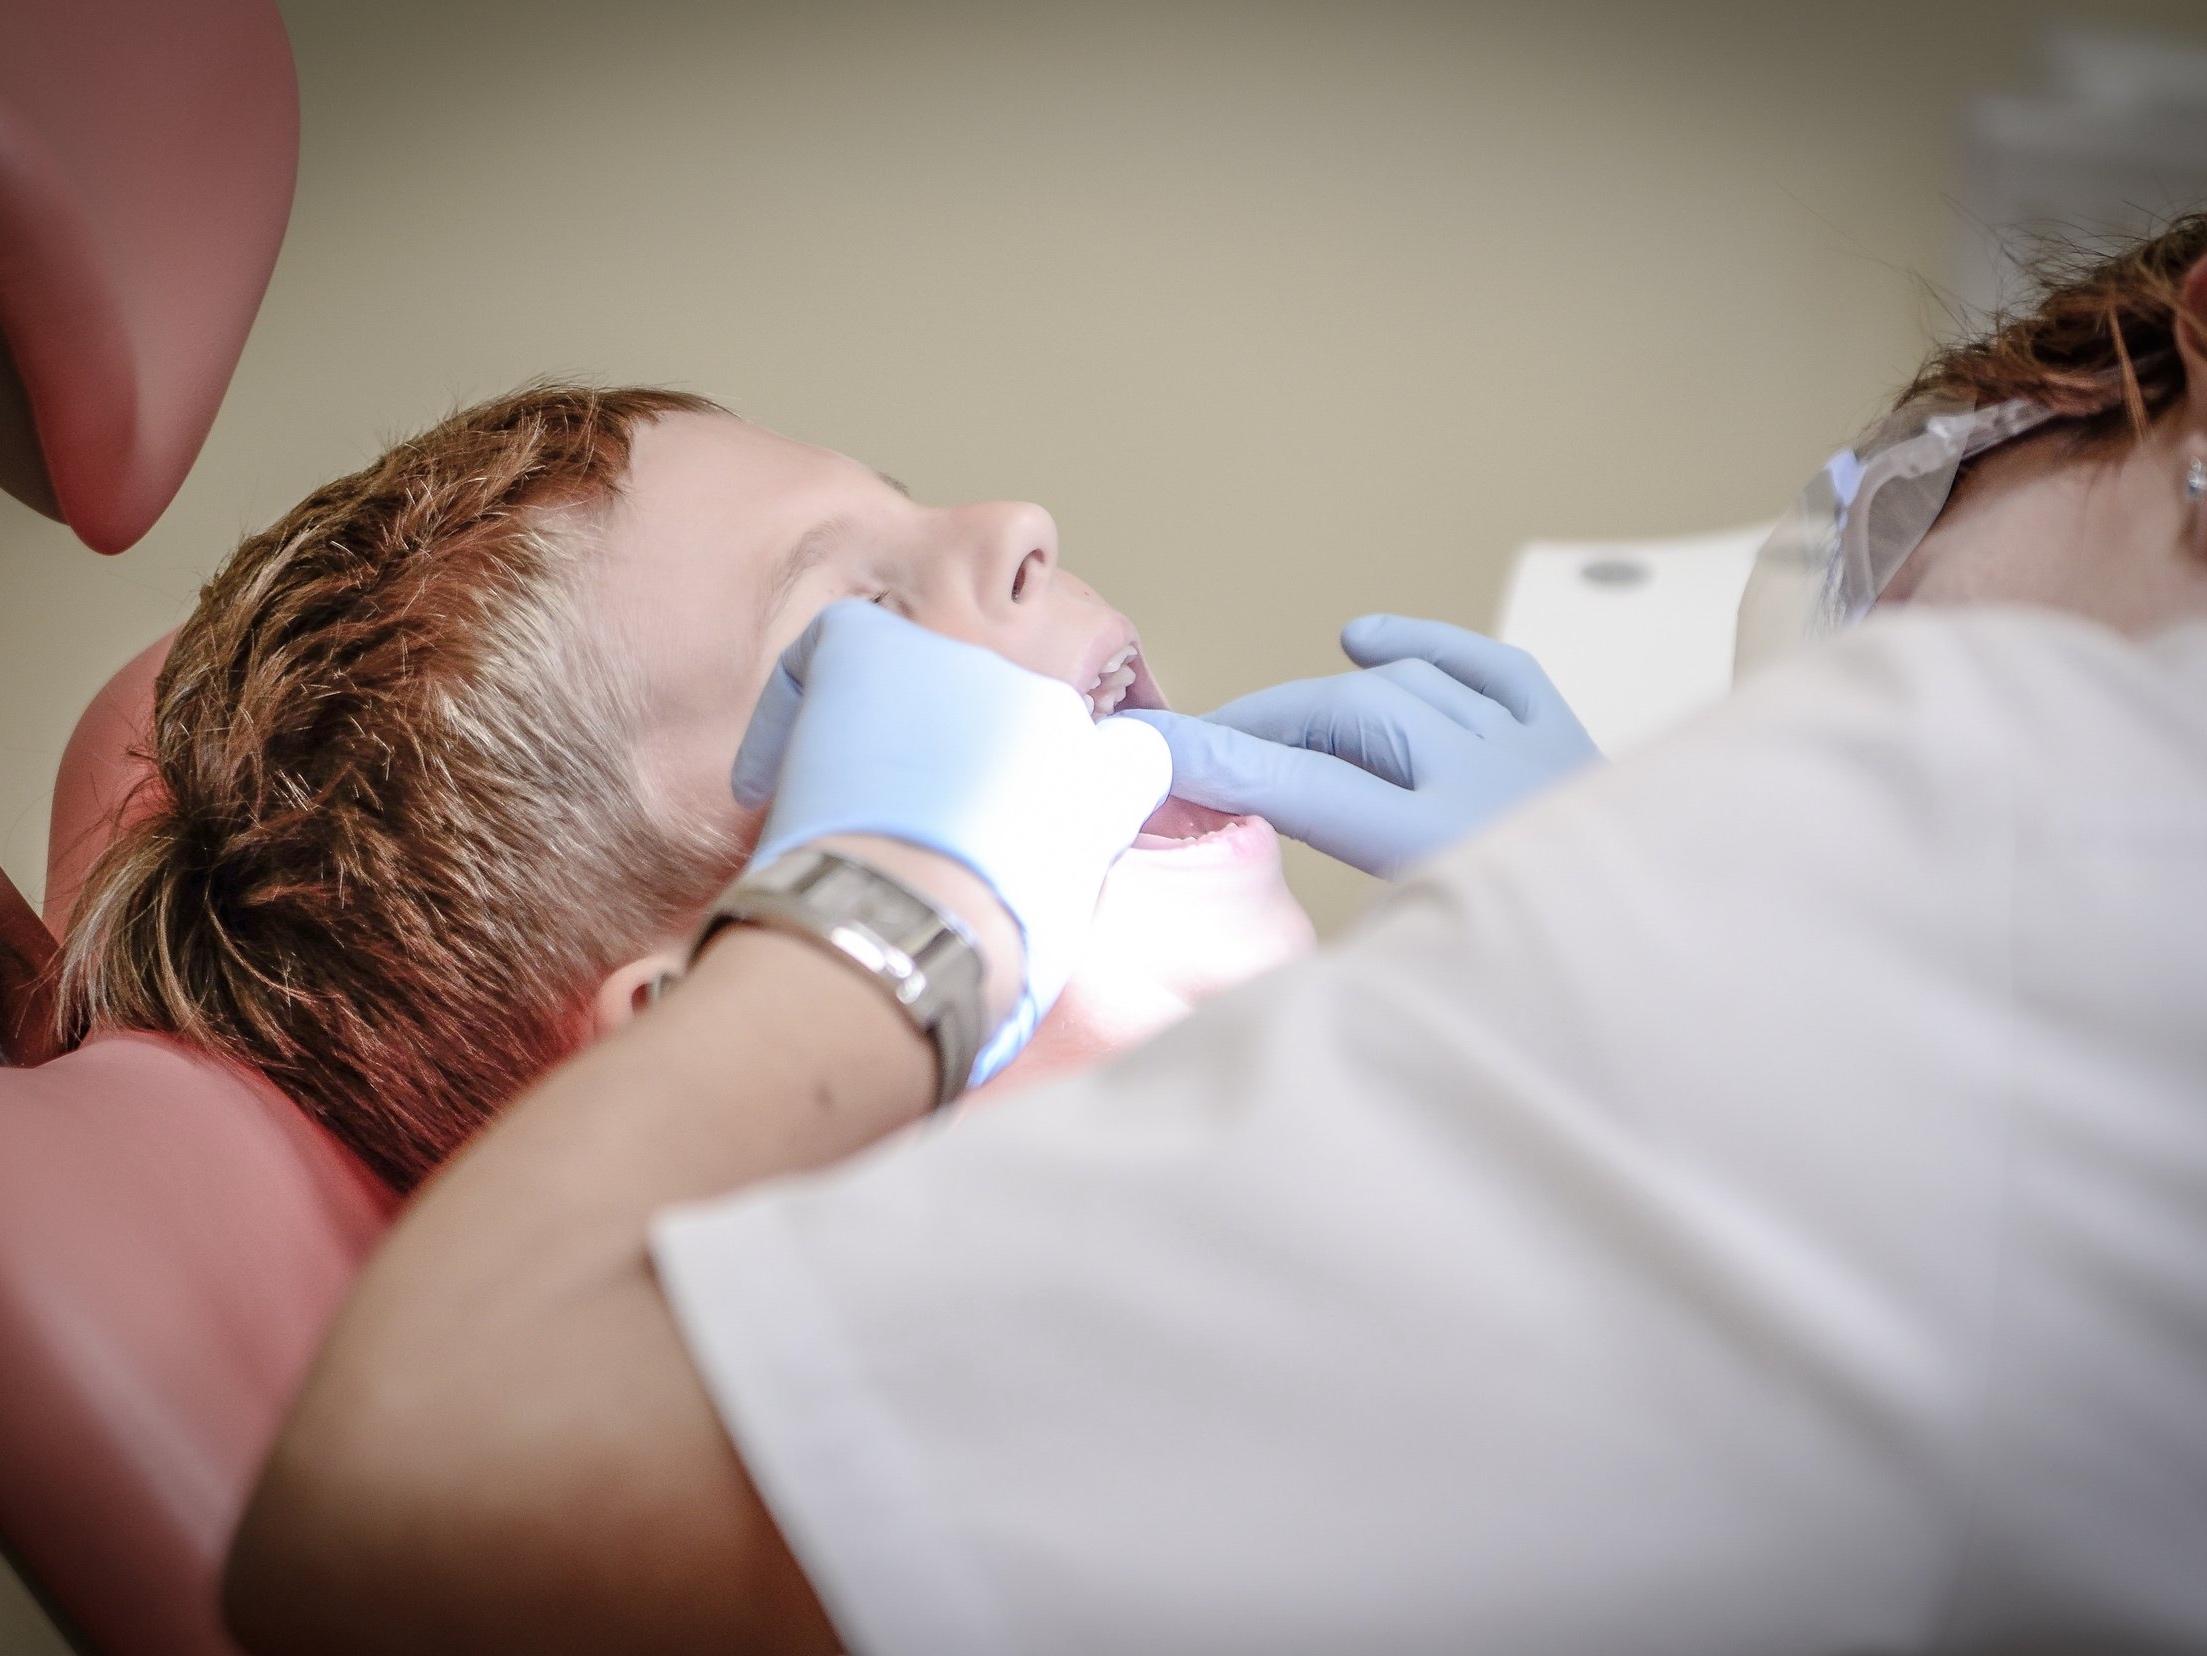 boy-check-up-dental-care-52527.jpg